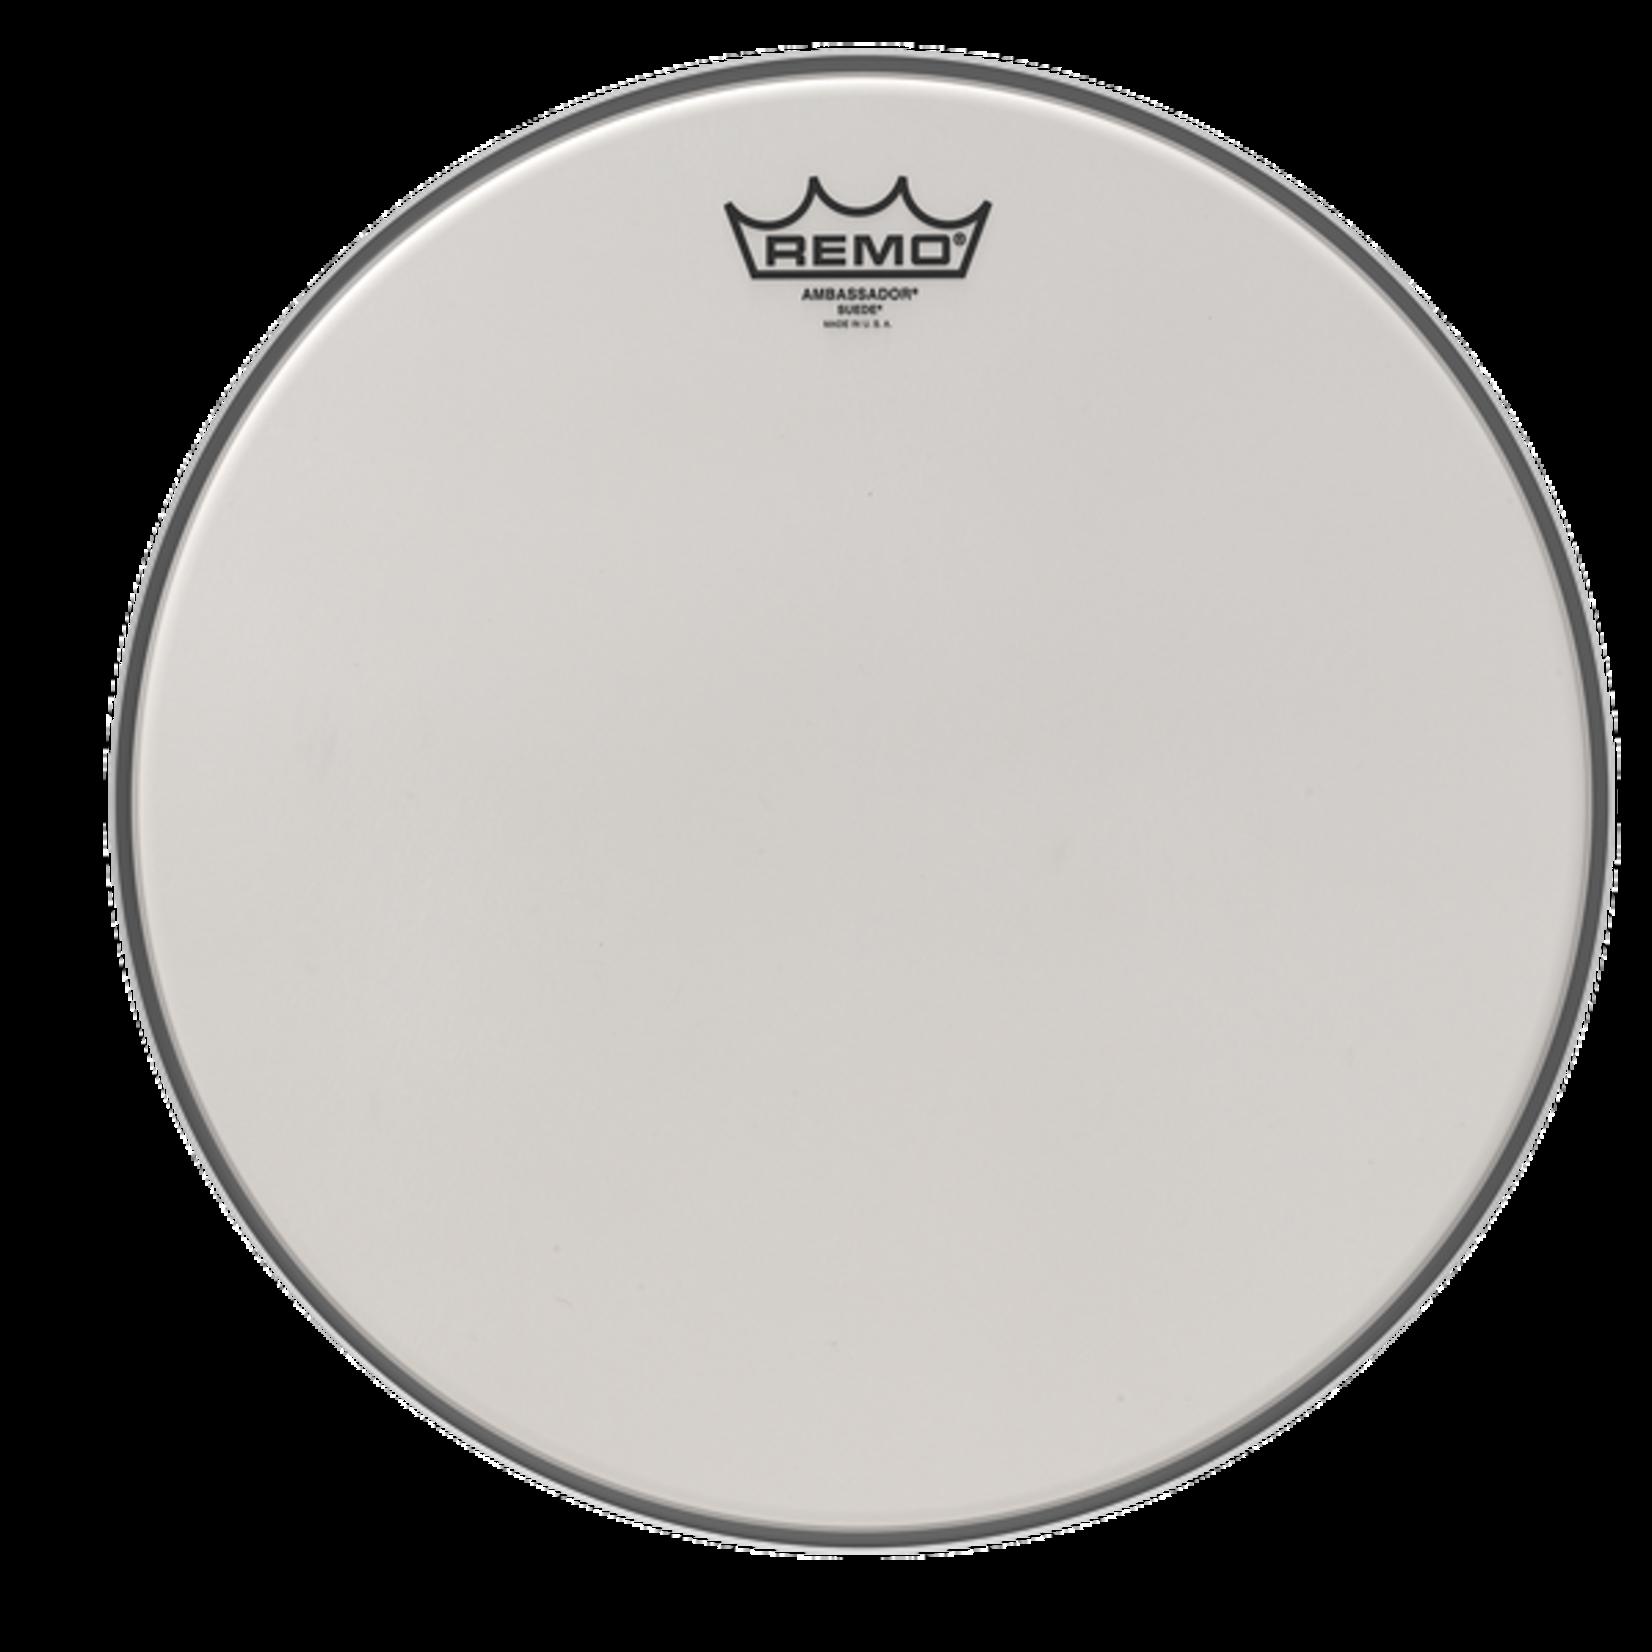 Remo Remo Suede Ambassador Bass Drum